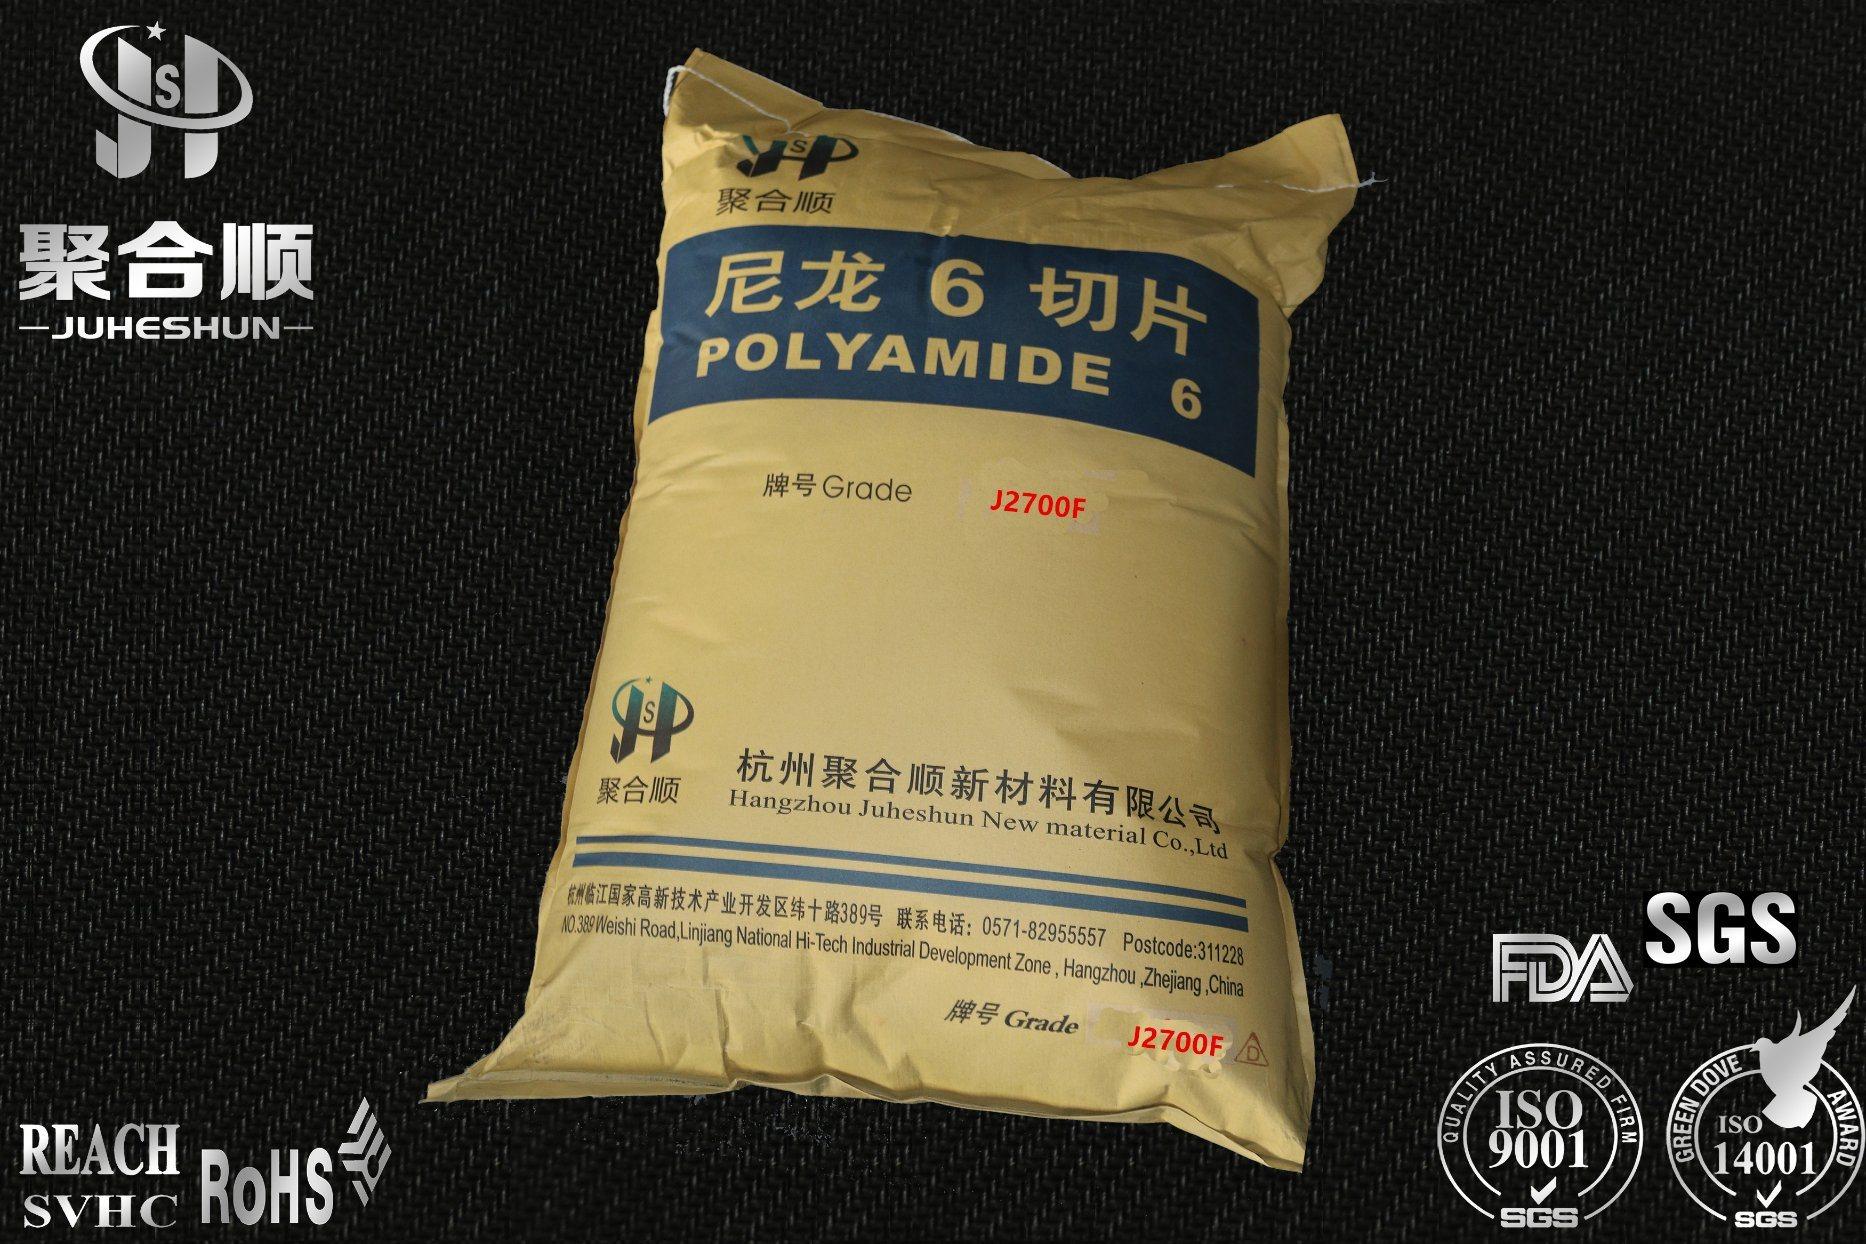 J2700f/Civilian Spinng Grade PA6/Nylon/Polyamide Granules/Pellets/Chips/PA6 Raw Material